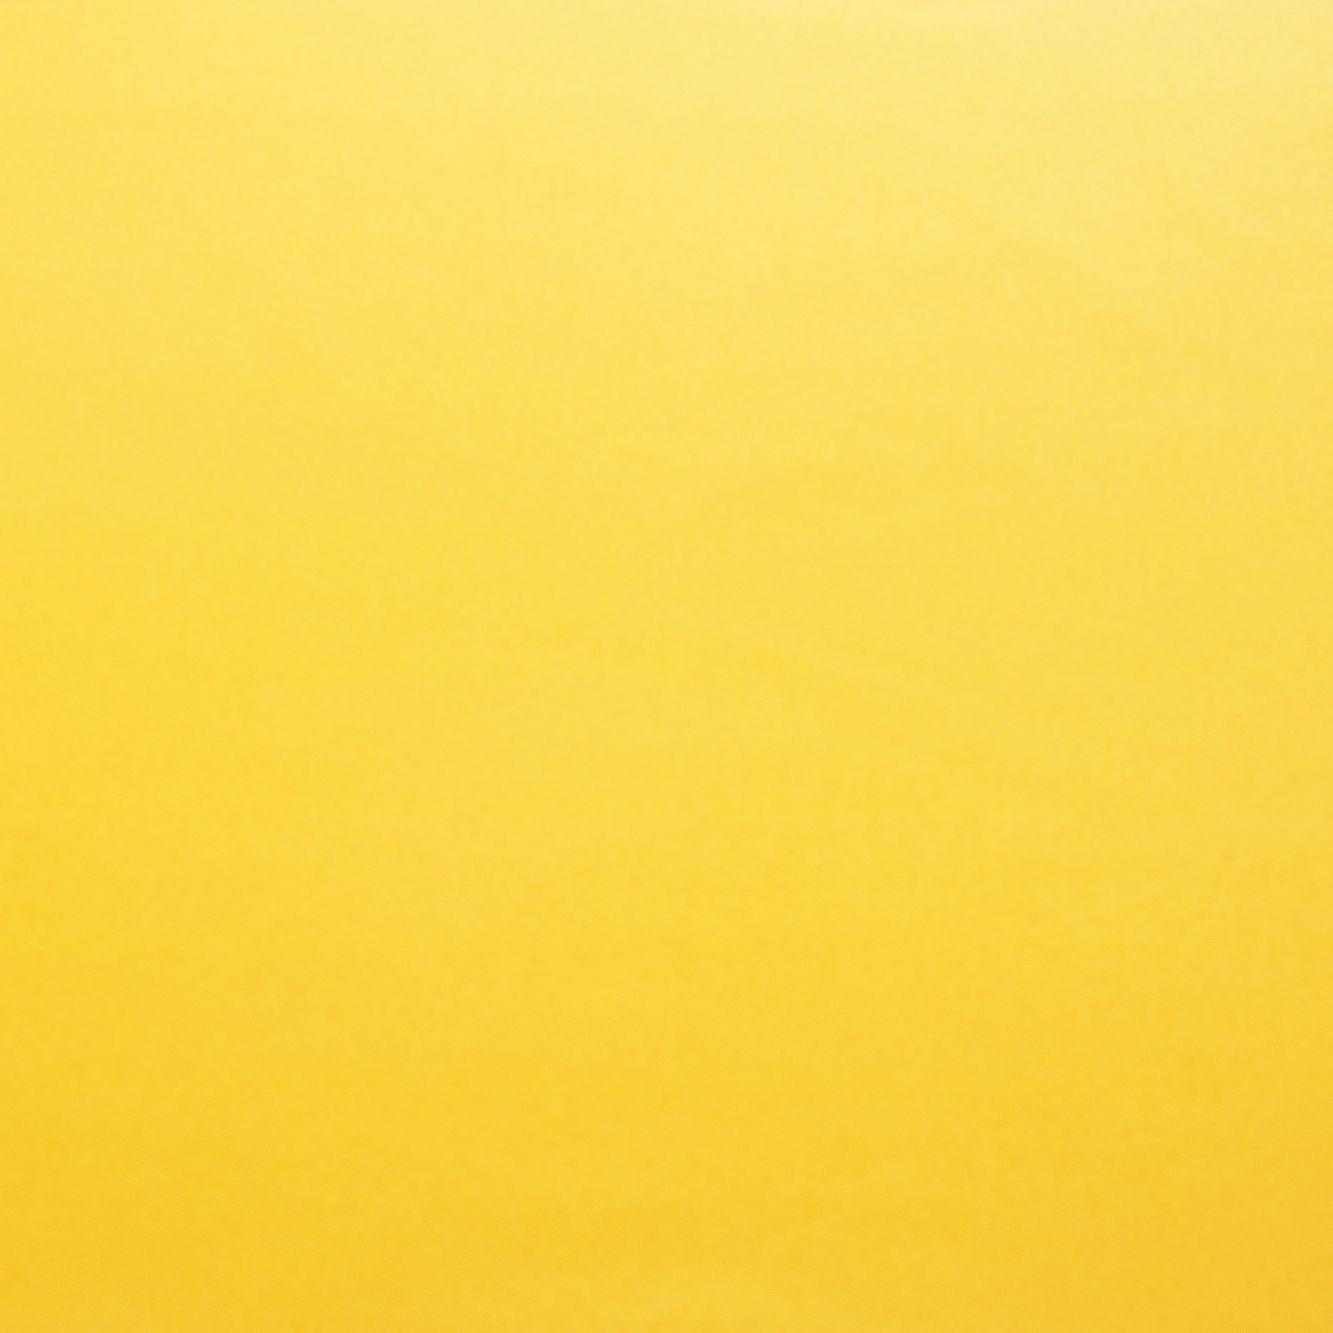 Tecido Oxford Mostarda 100% Poliester 1,50 m Largura